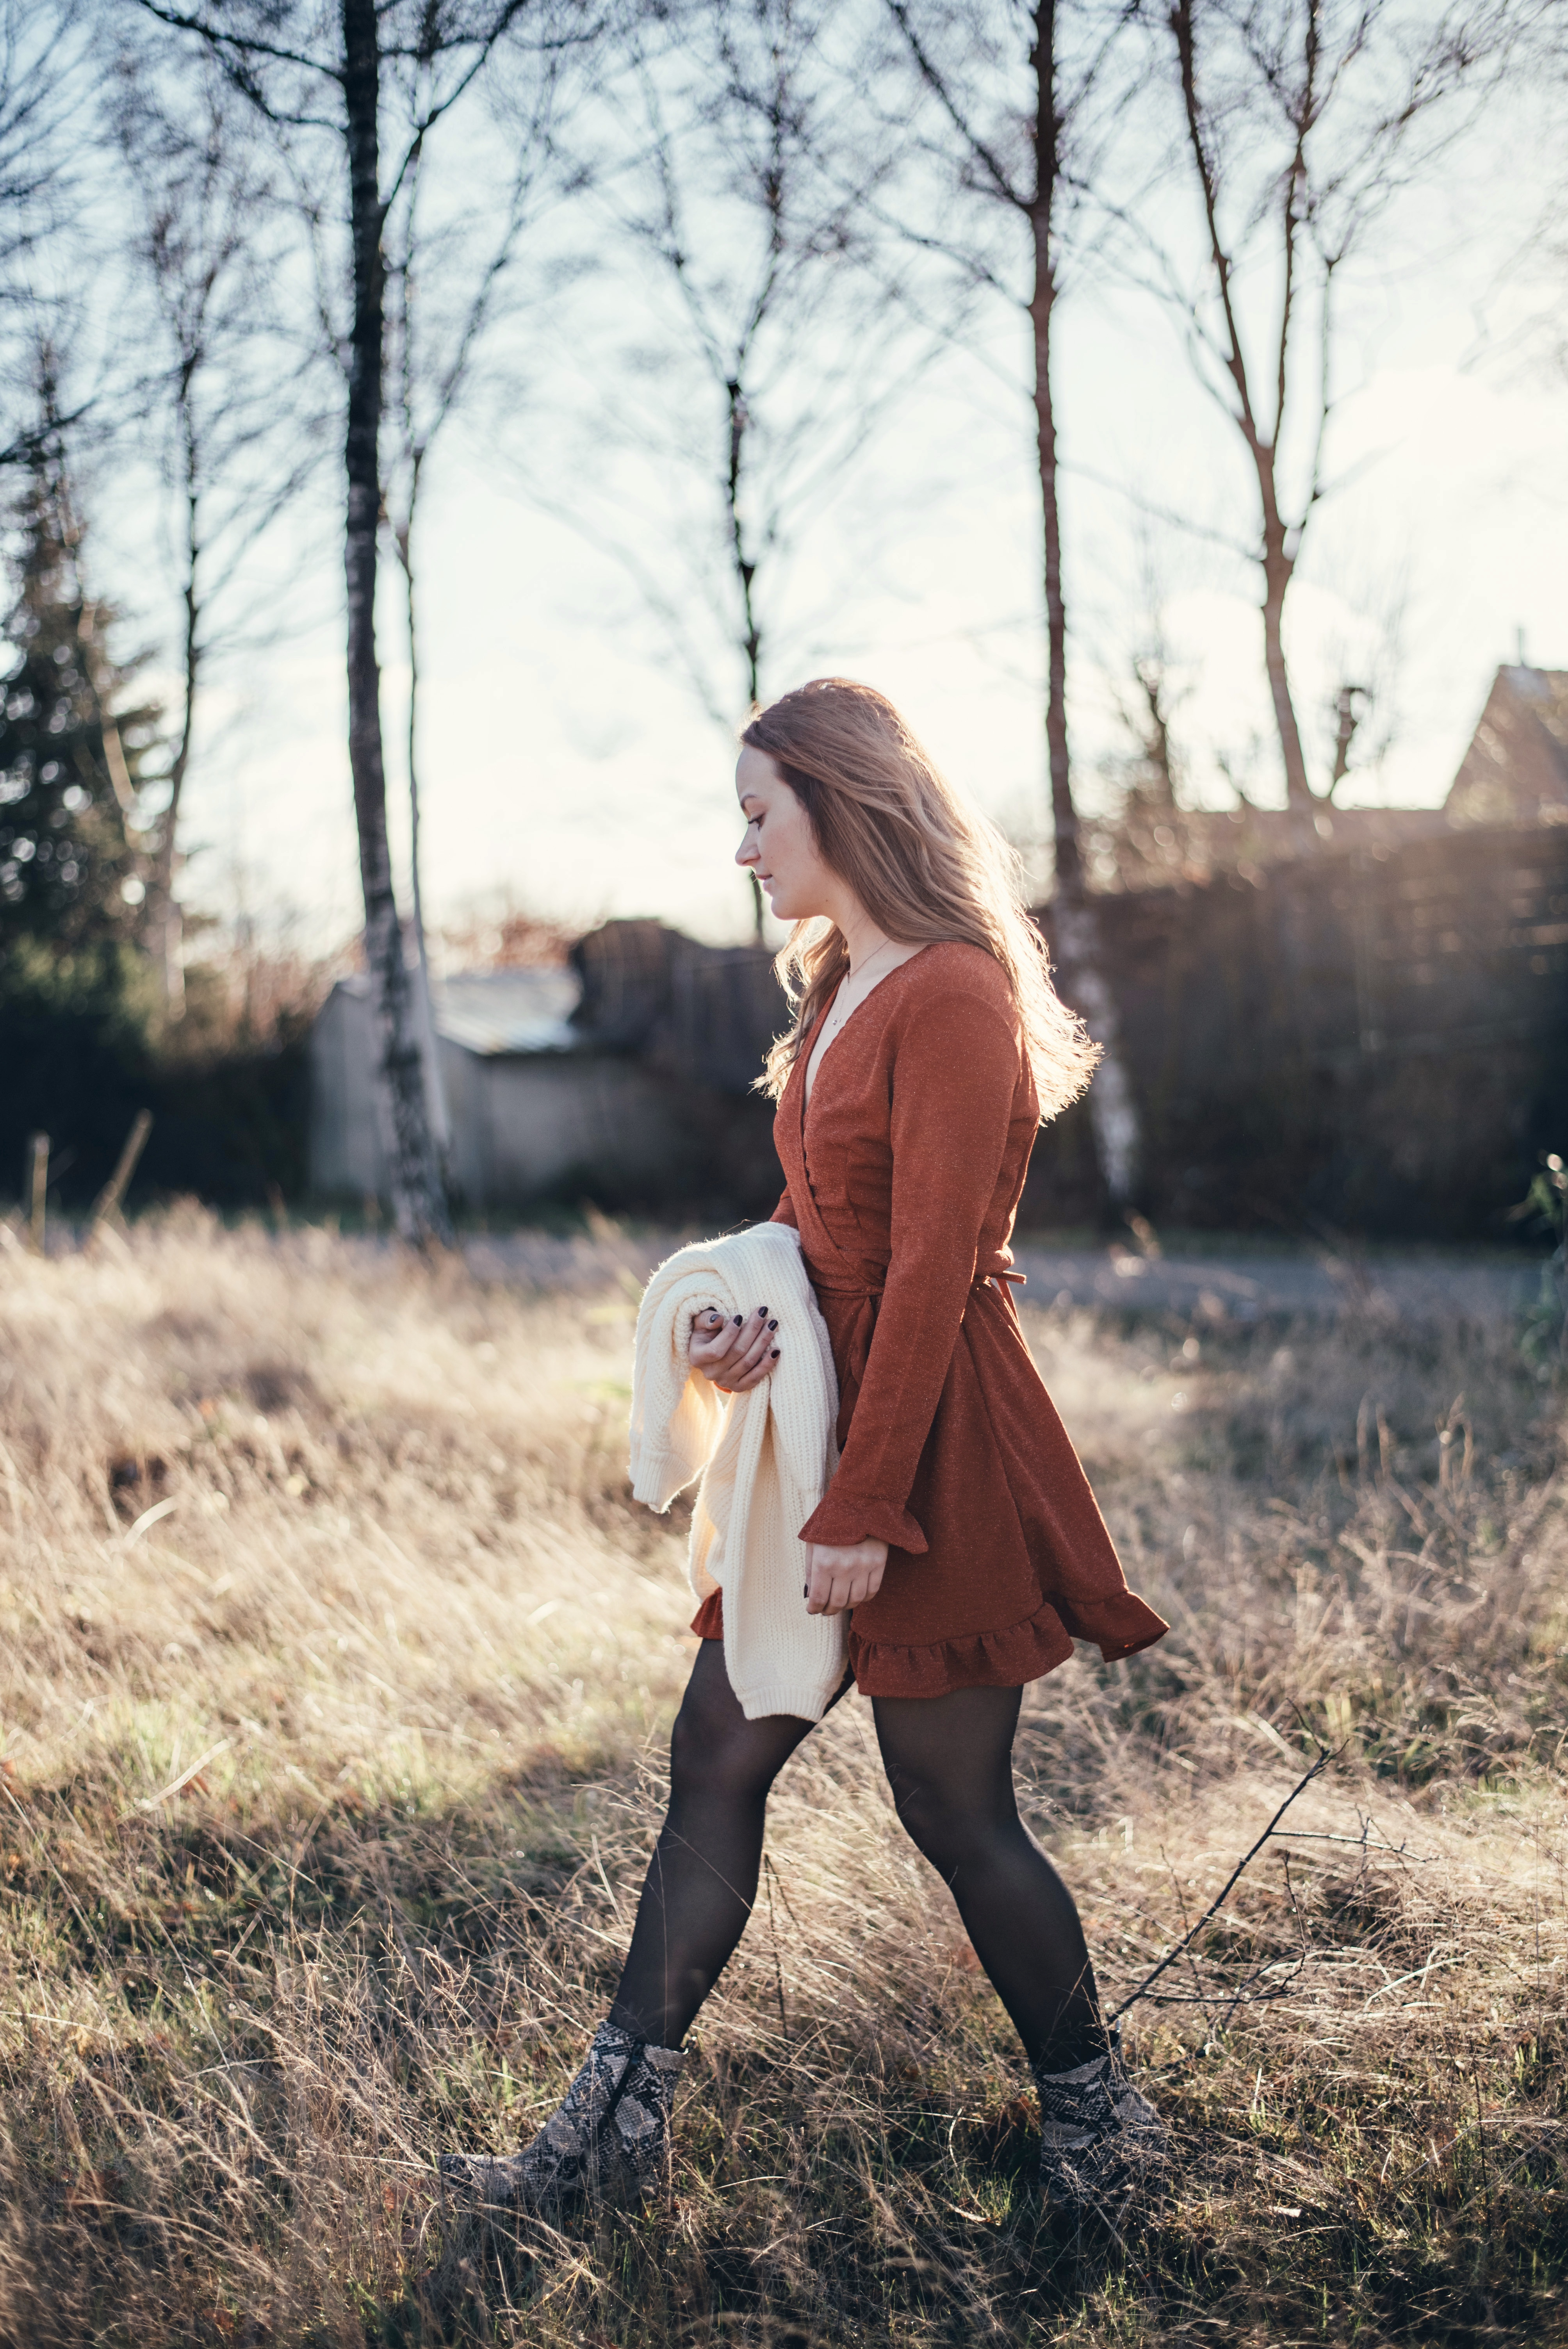 xmariekie, blog, blogger, nederlandse blogger, eindhoven, noord-brabant, brabant, boutique 22, kleine berg, ootd, jurkje, fotoshoot, model, buitenfotografie, vrolijk, bladel, winkelen, shoppen, online shoppen